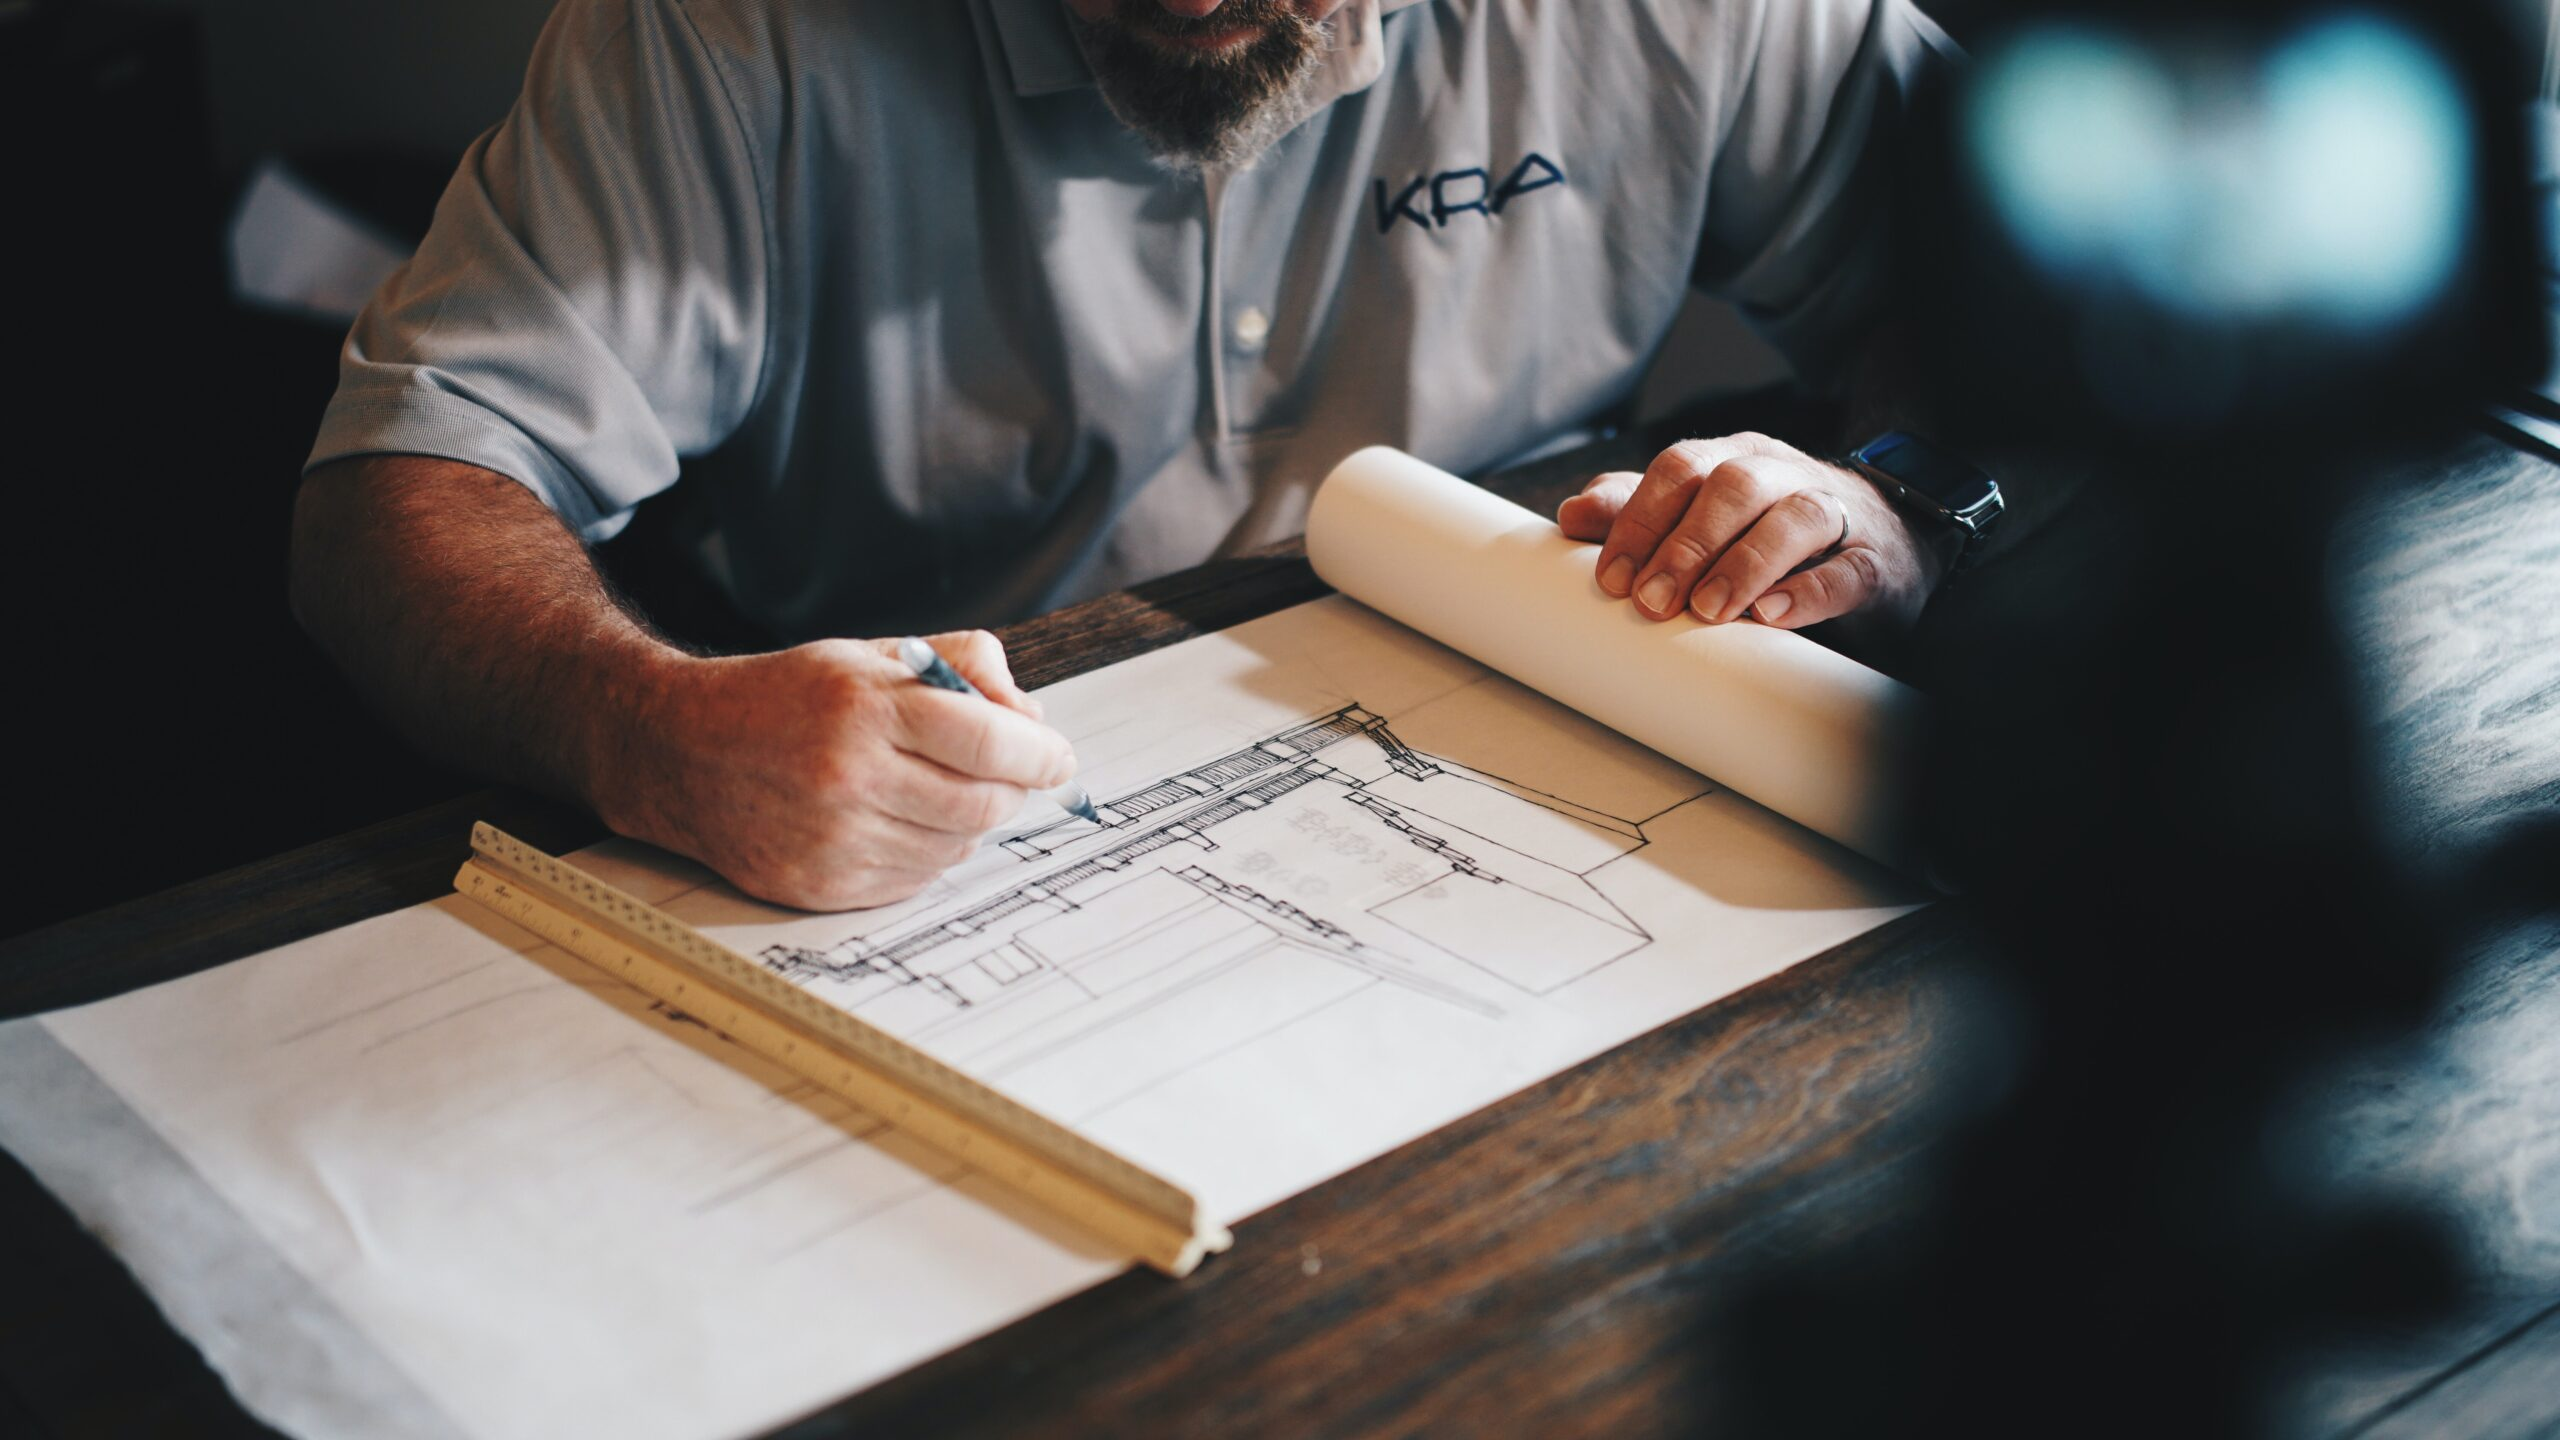 Man Construction Planning